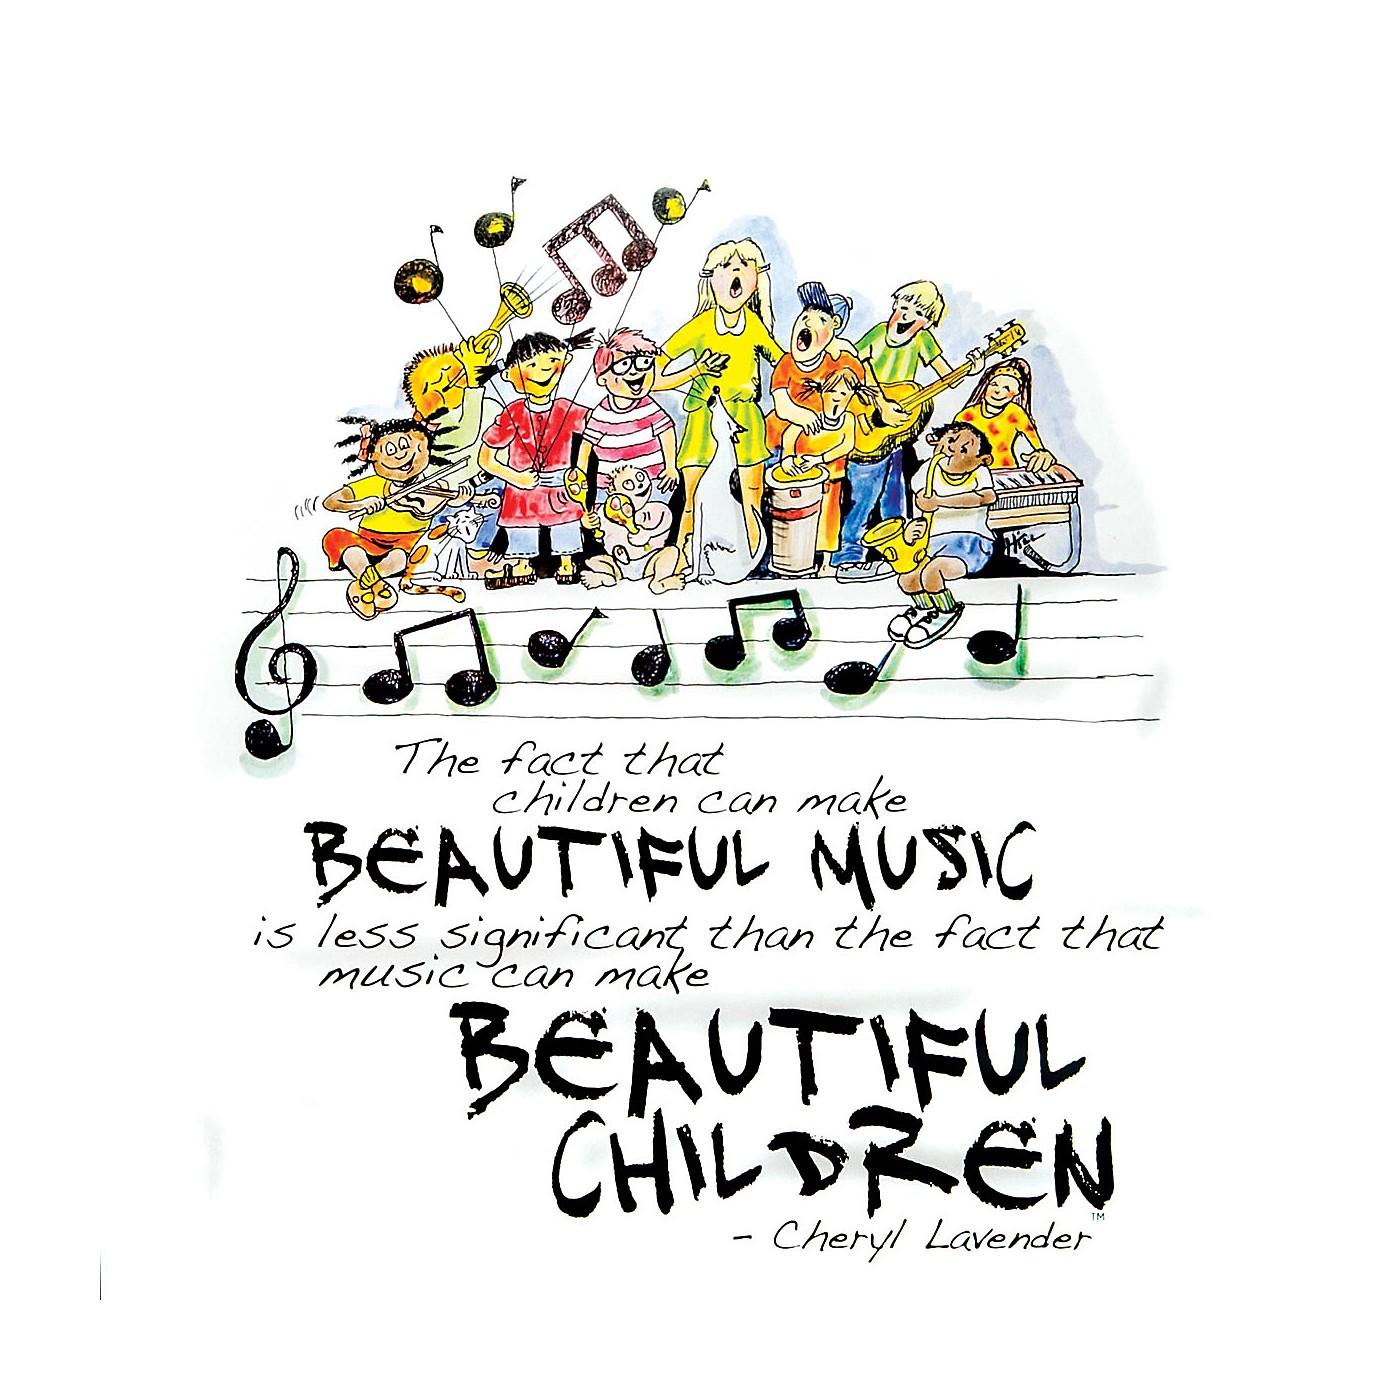 Hal Leonard Beautiful Music, Beautiful Children Print (12x12 Unframed Print) Composed by Cheryl Lavender thumbnail